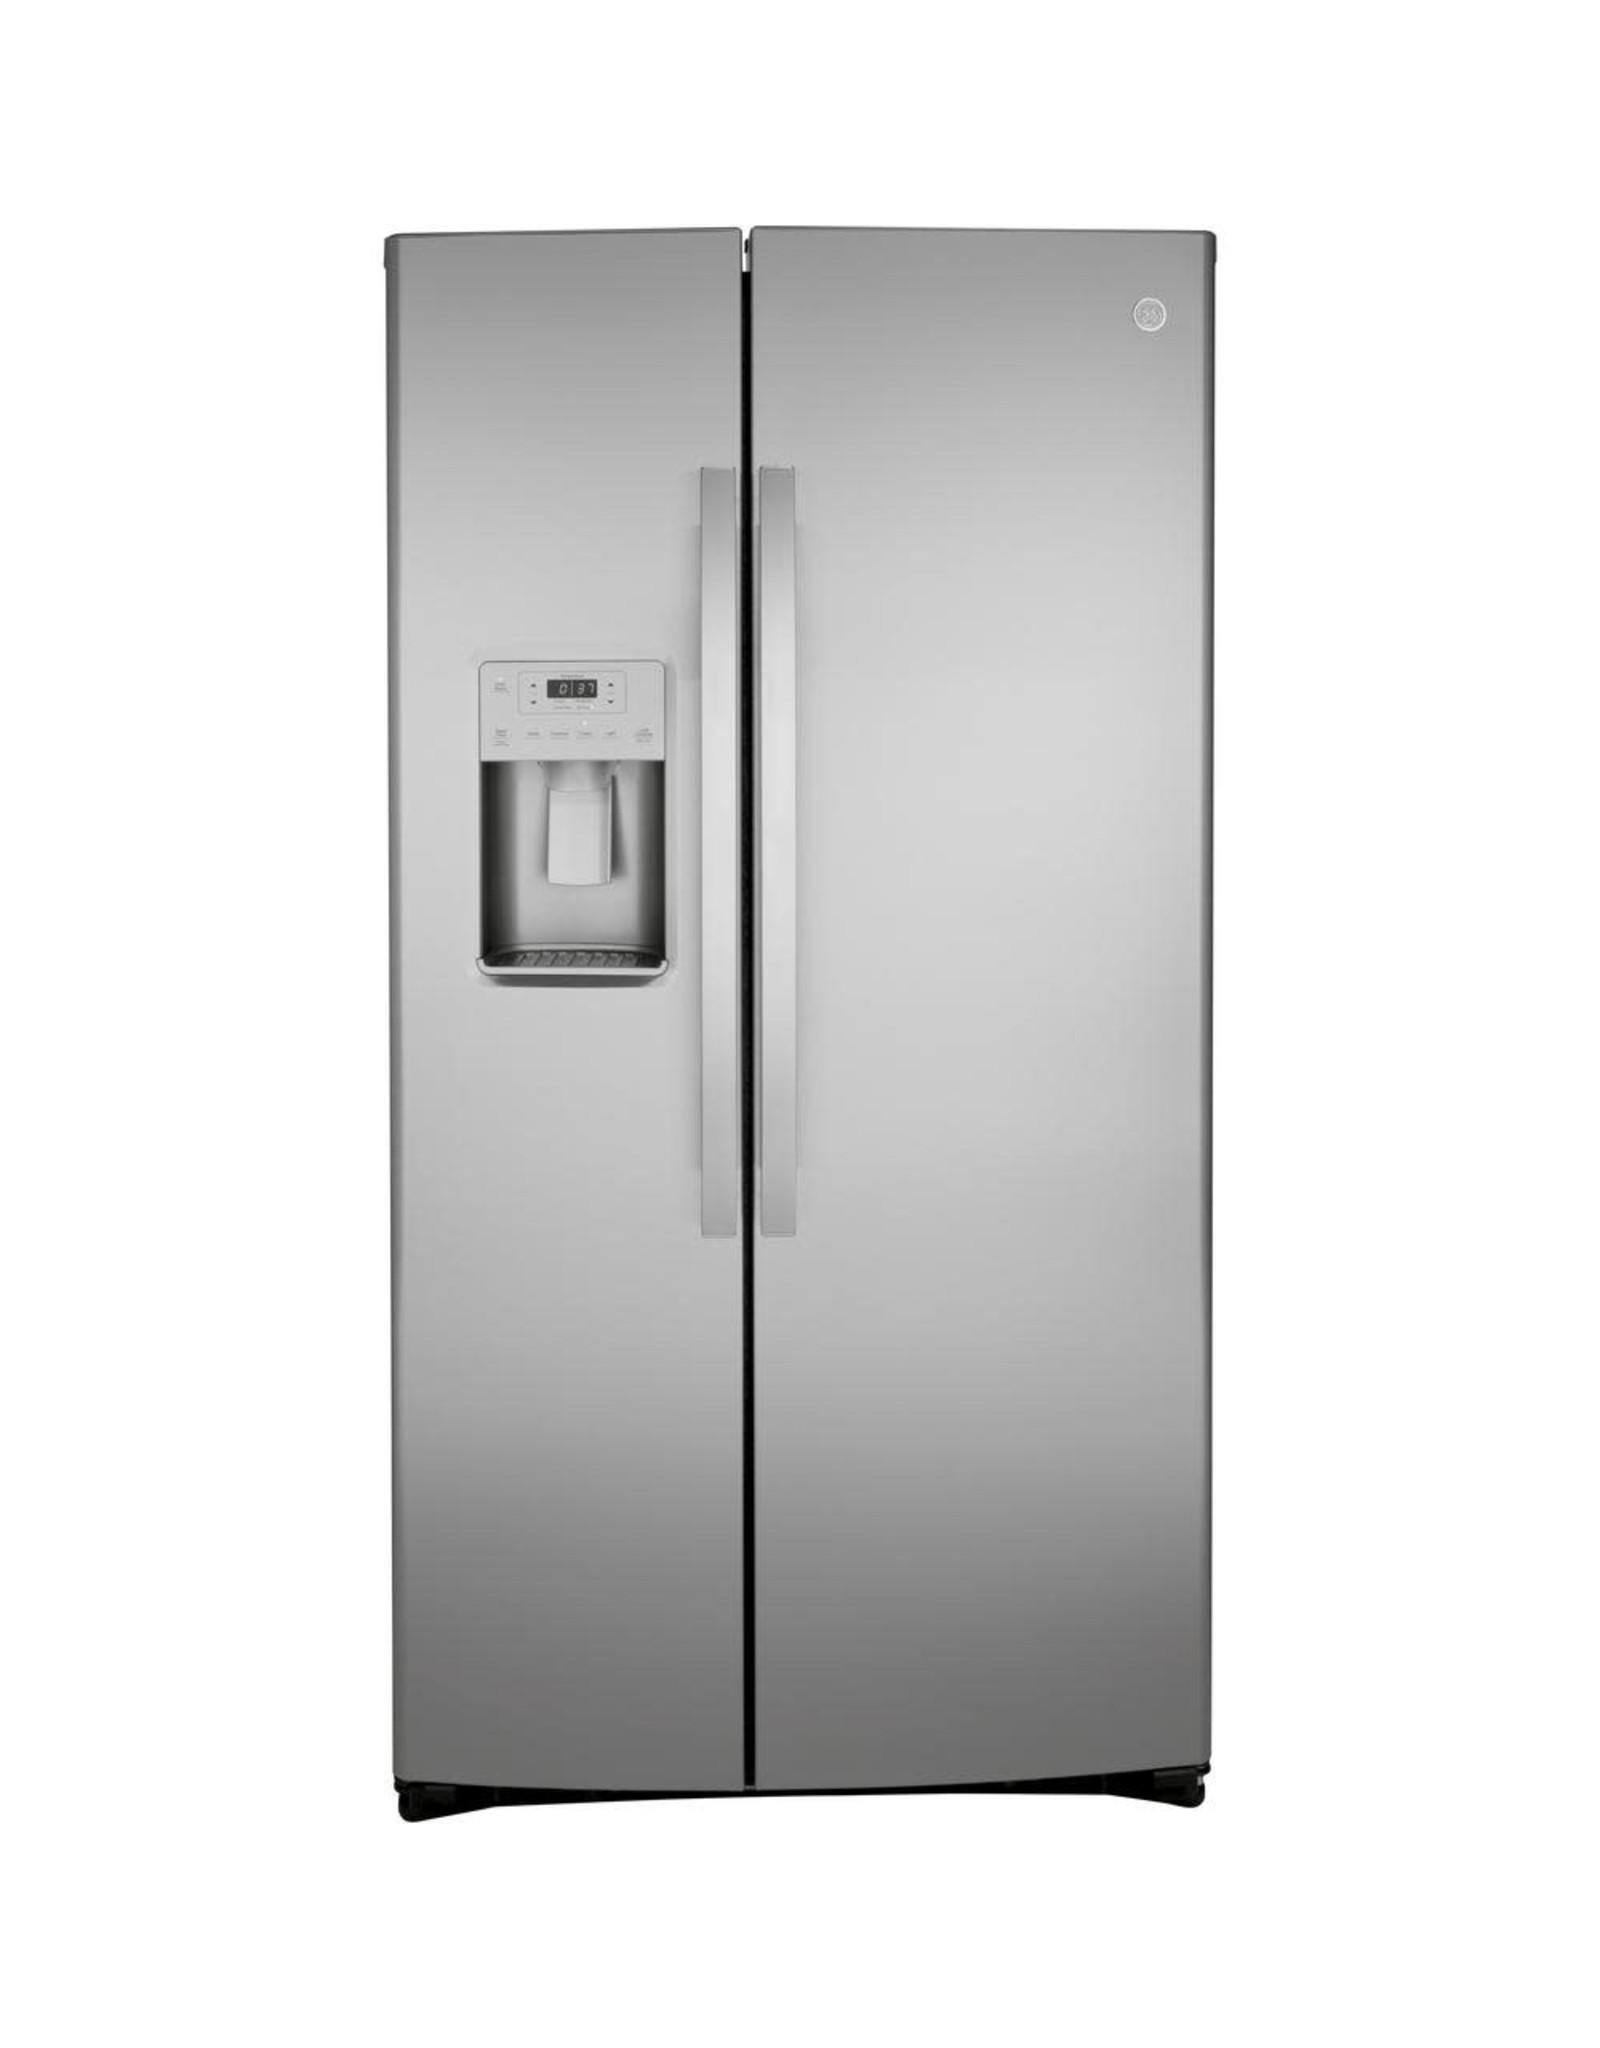 GE 25.1 cu. ft. Side by Side Refrigerator in Fingerprint Resistant Stainless Steel